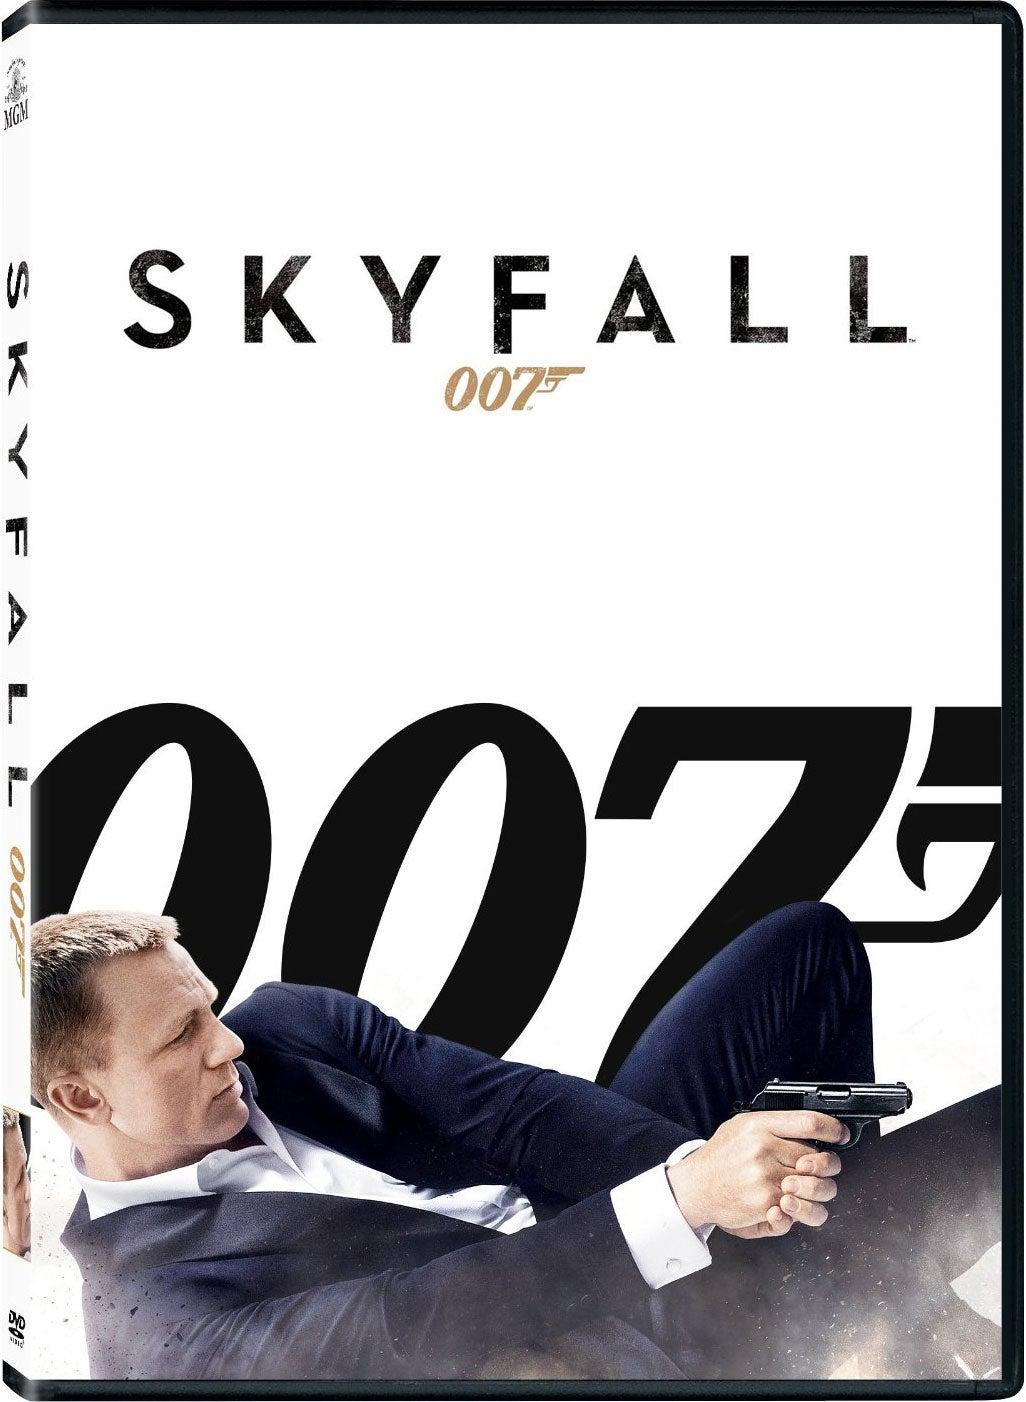 Skyfall - James Bond 007 (DVD)